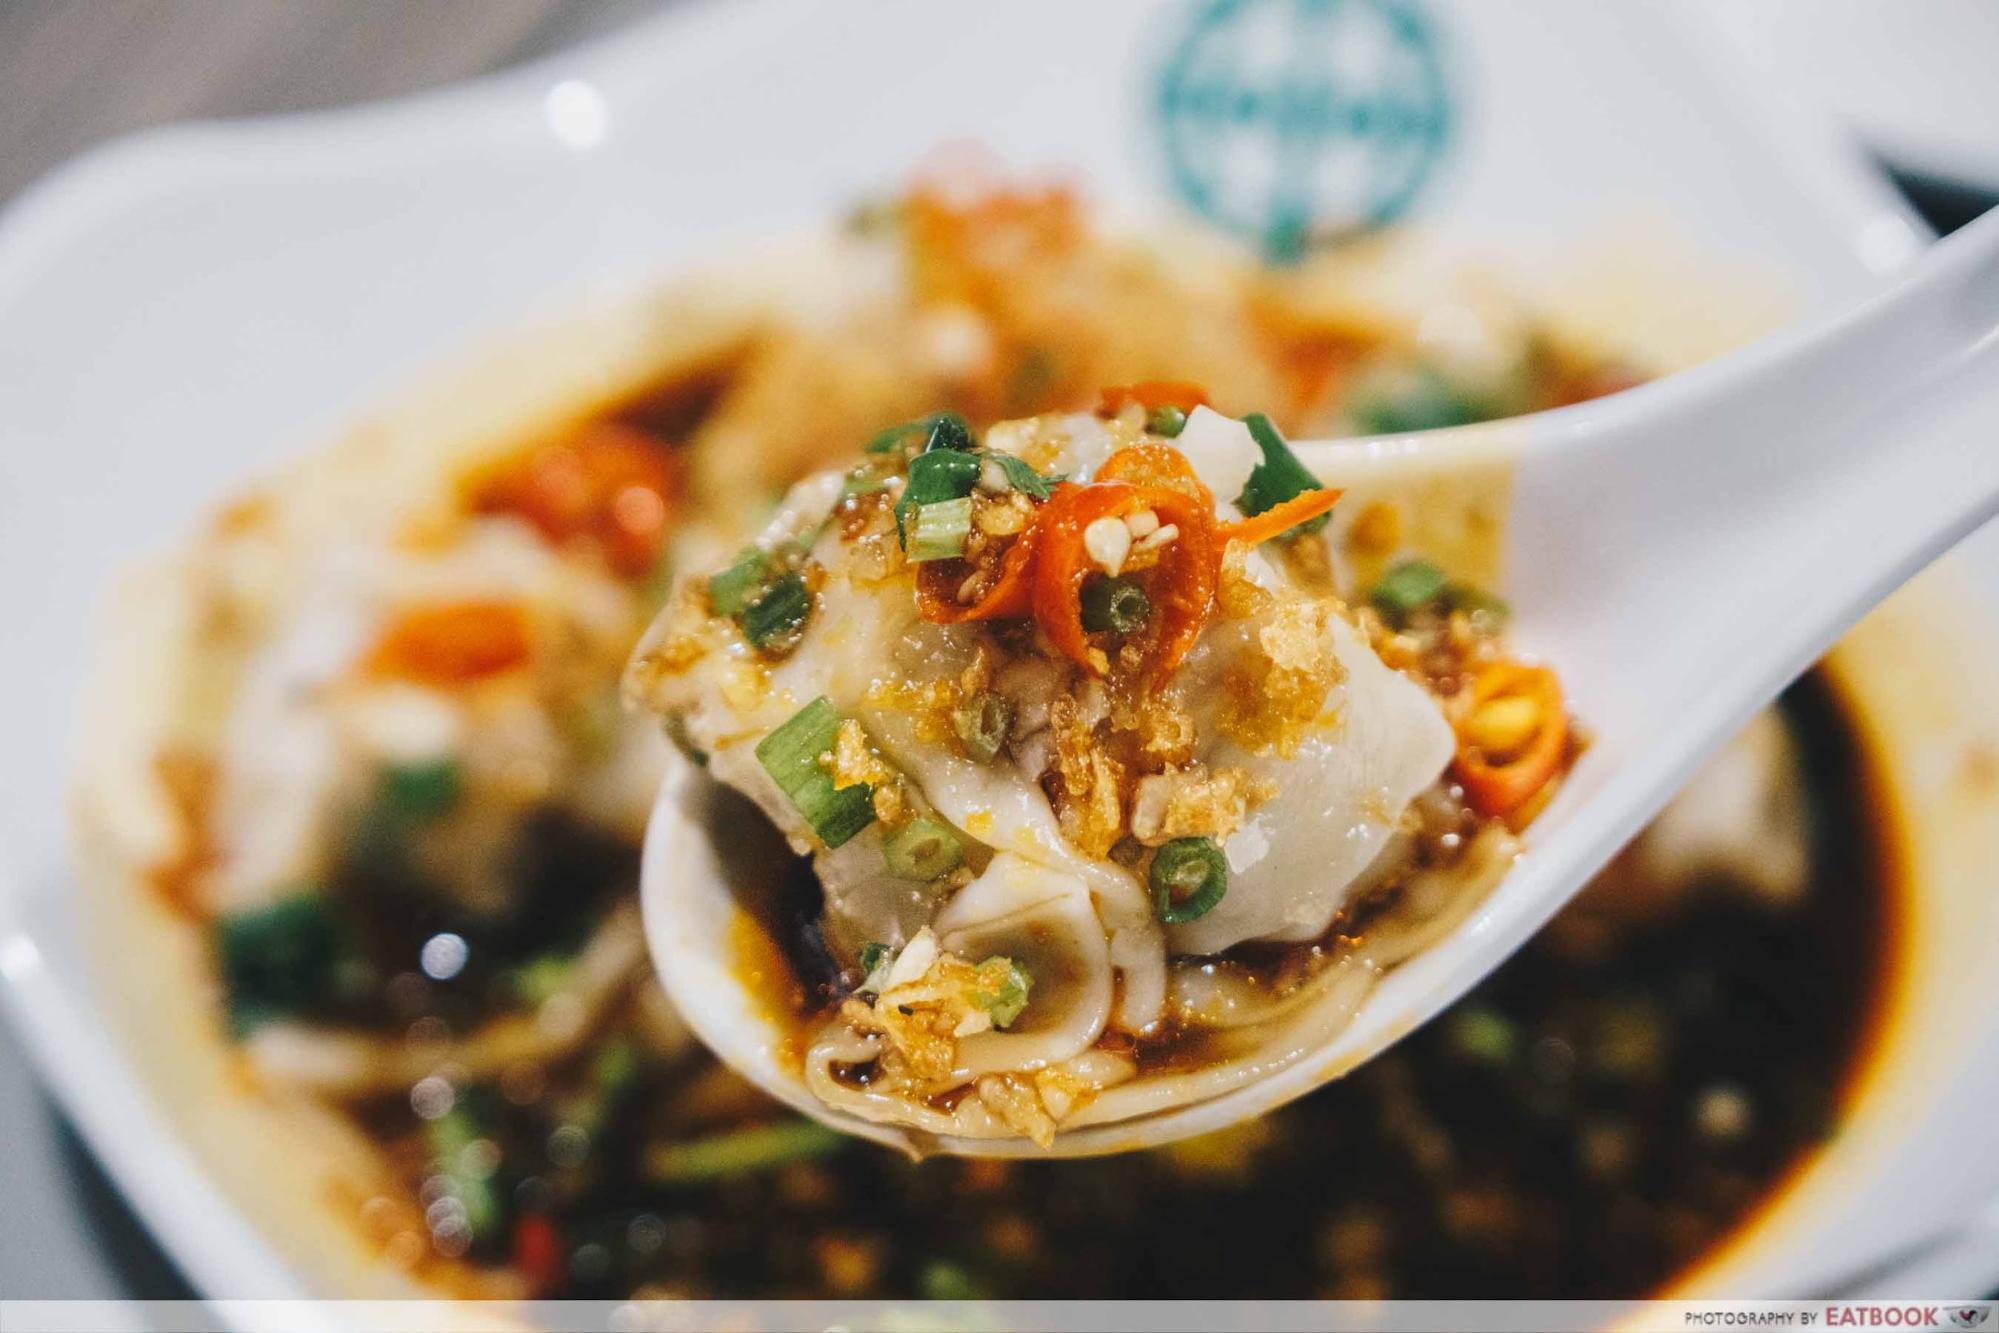 10 New Restaurants March - Tim Ho Wan Baked Pork Dumplings & Spicy Sauce